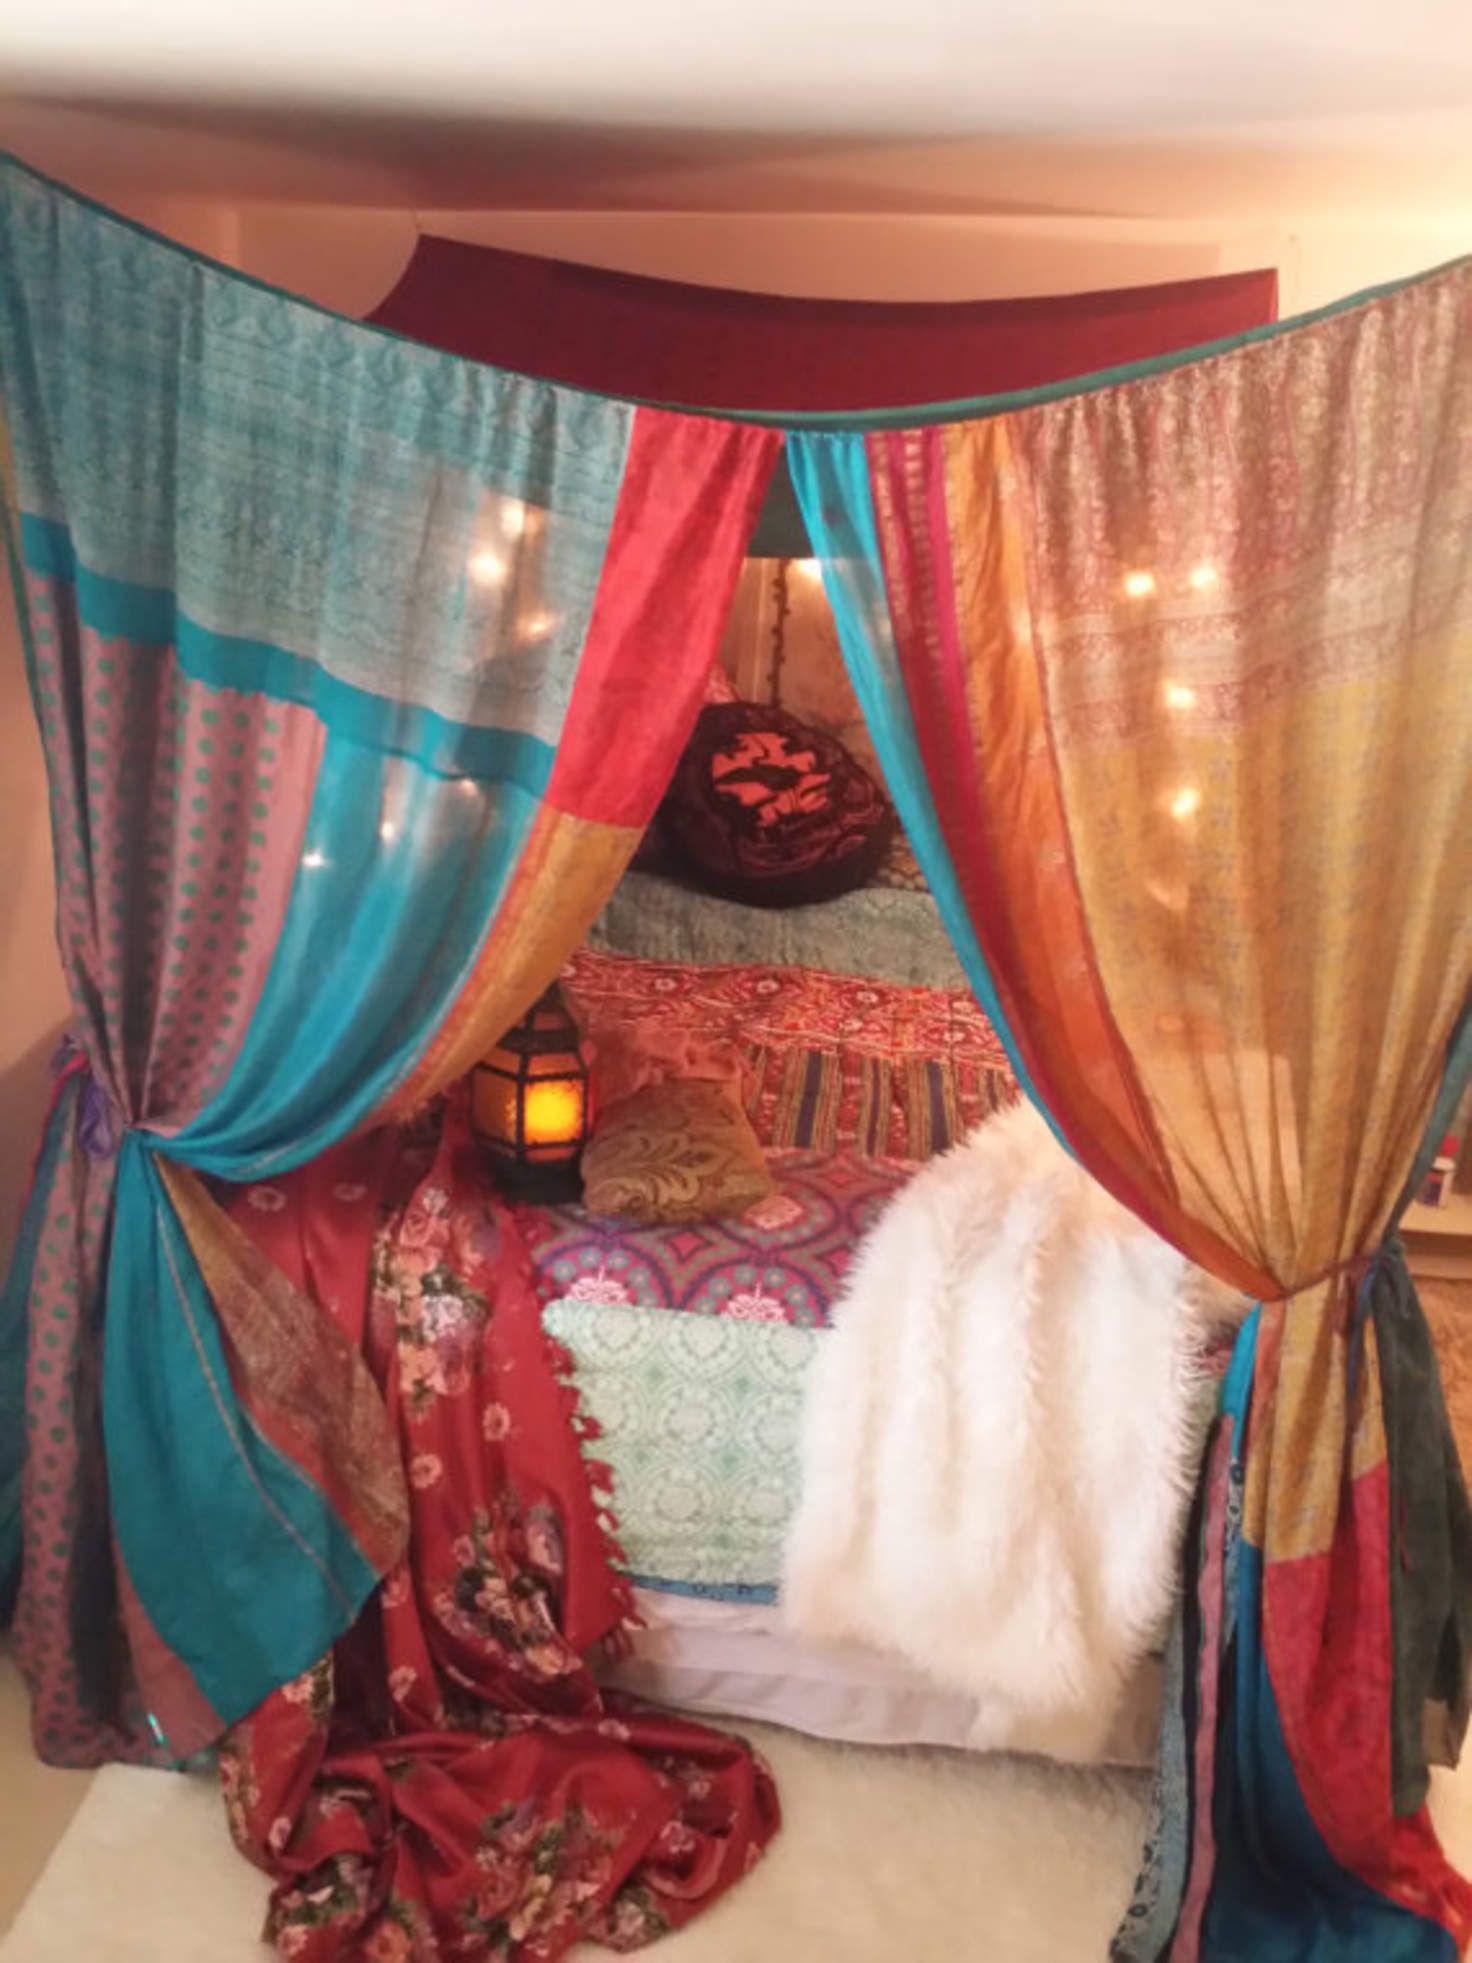 Bed canopy gypsy - Boho Bed Canopy Gypsy Hippie Hippy Hippiewild Patchwork India Sari Scarves Bedroom Decor Bohemian Chic